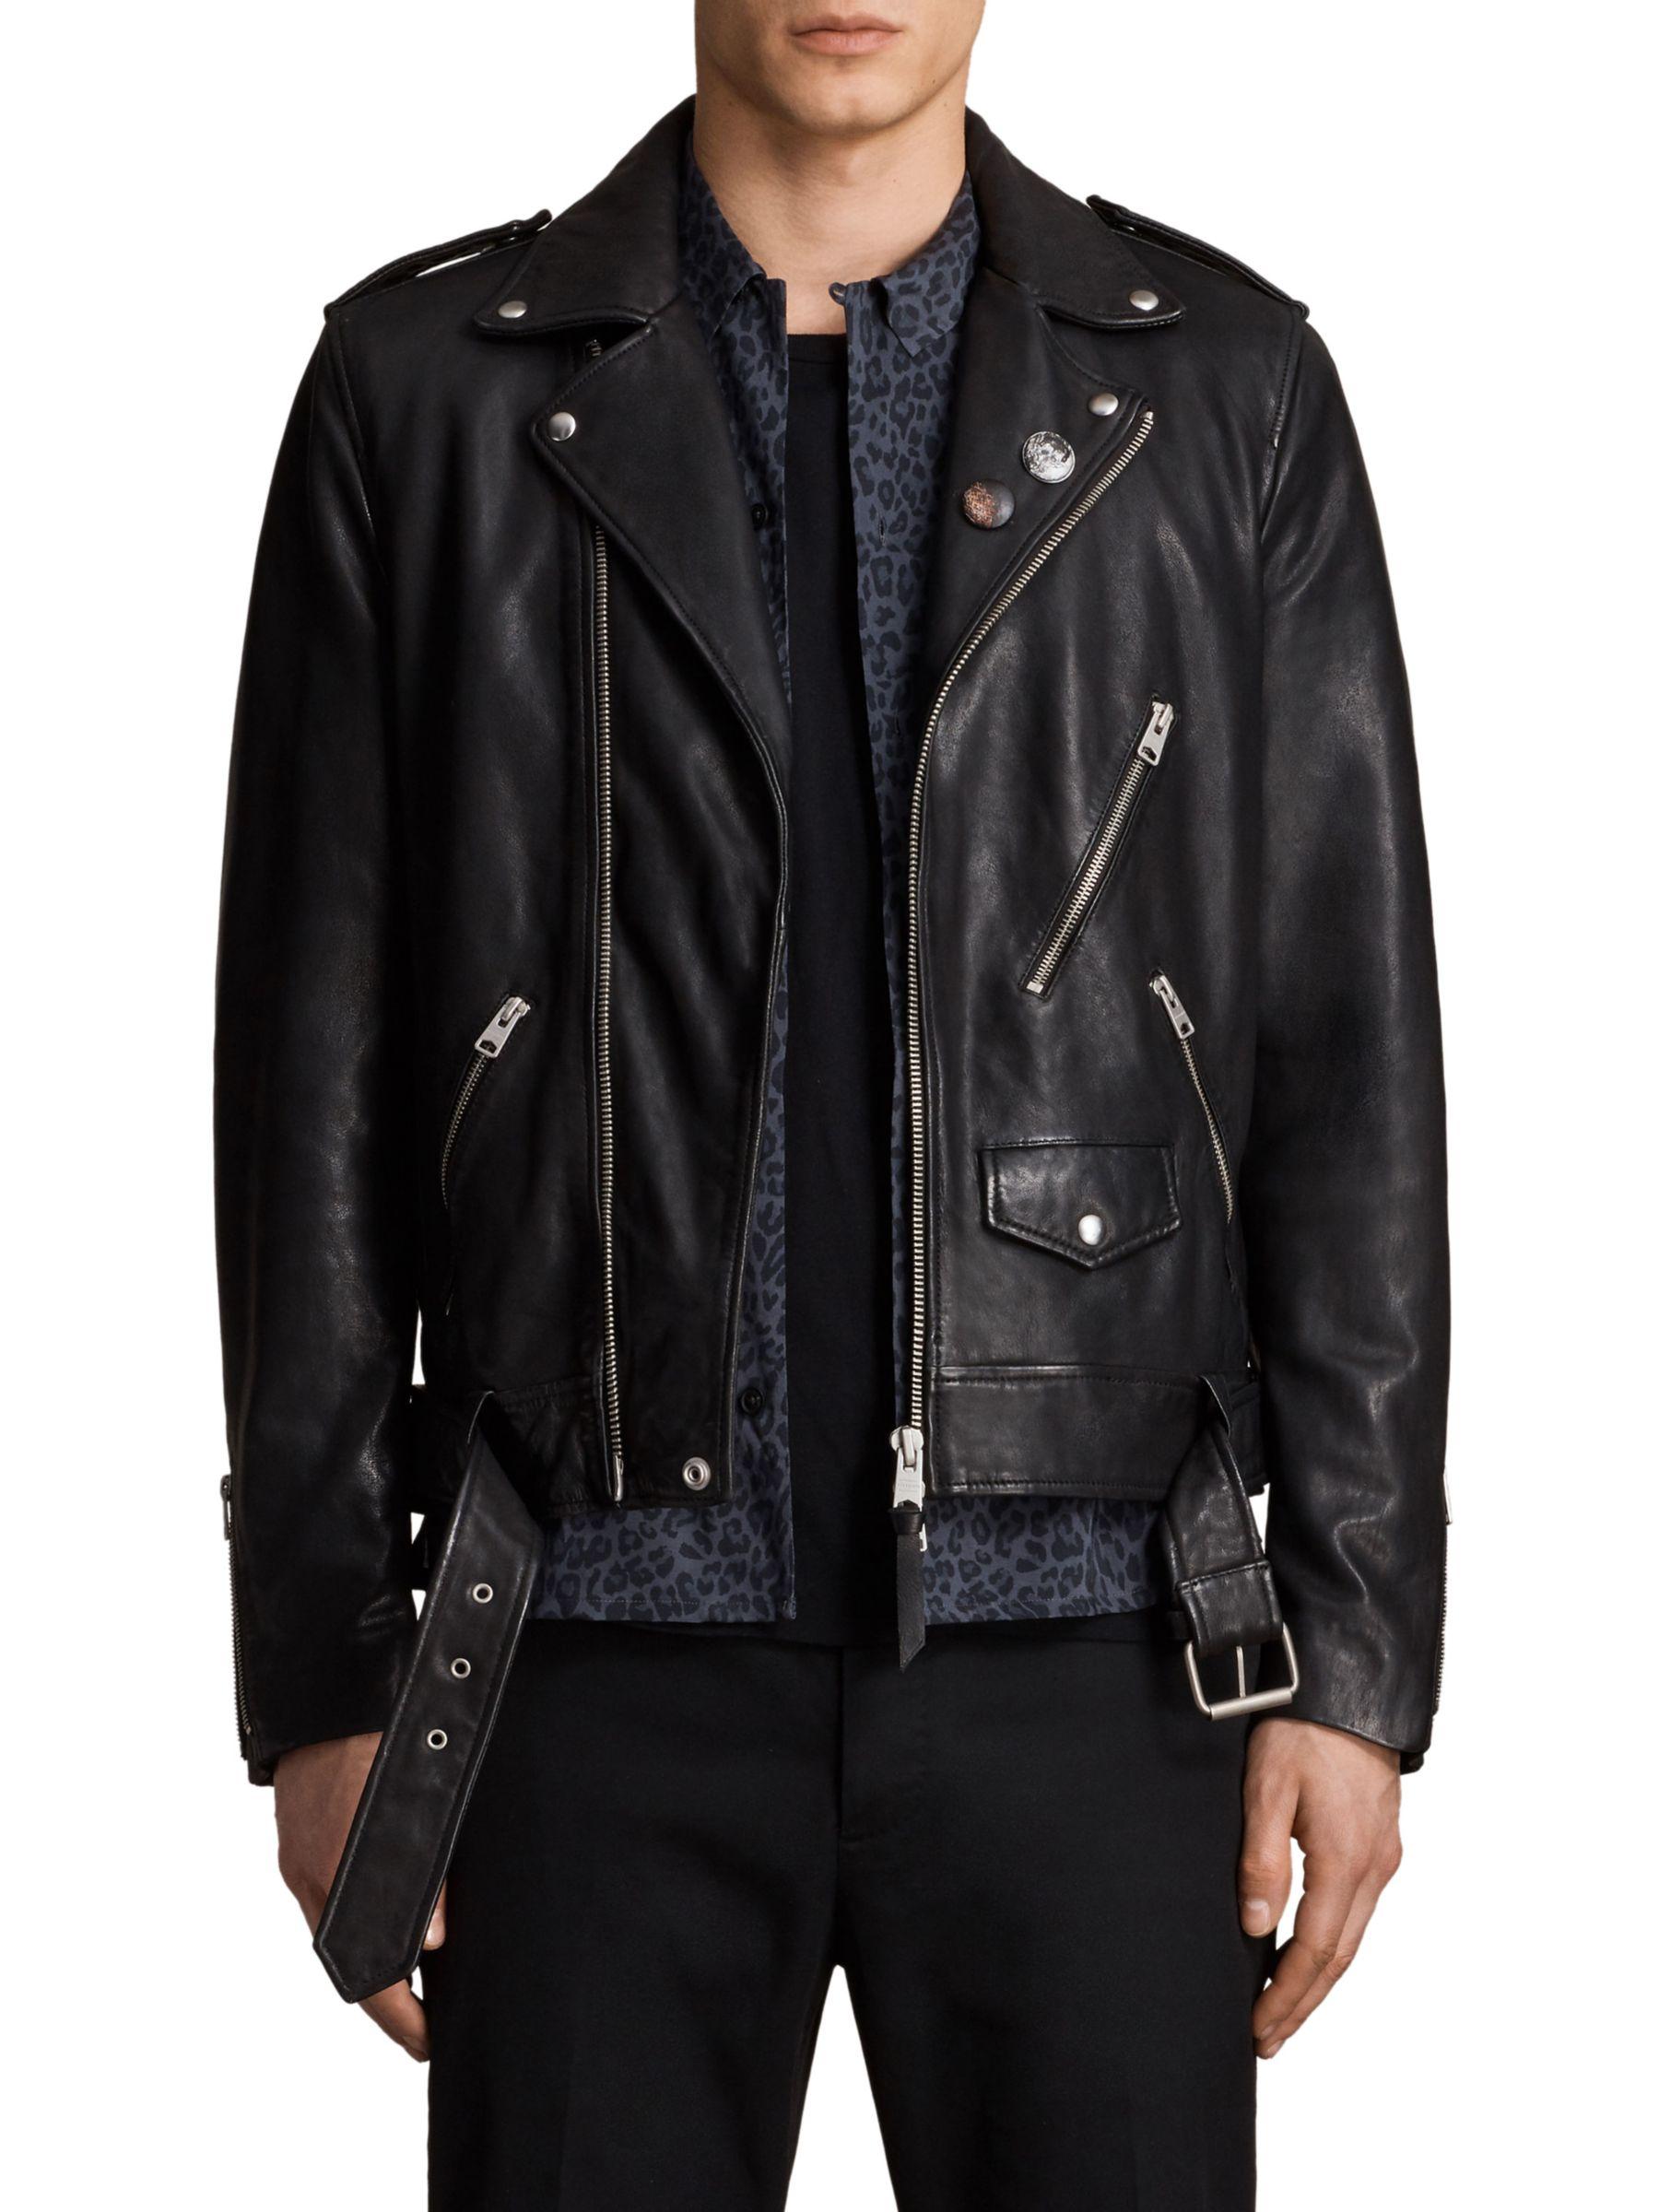 AllSaints AllSaints Volt Biker Leather Jacket, Black